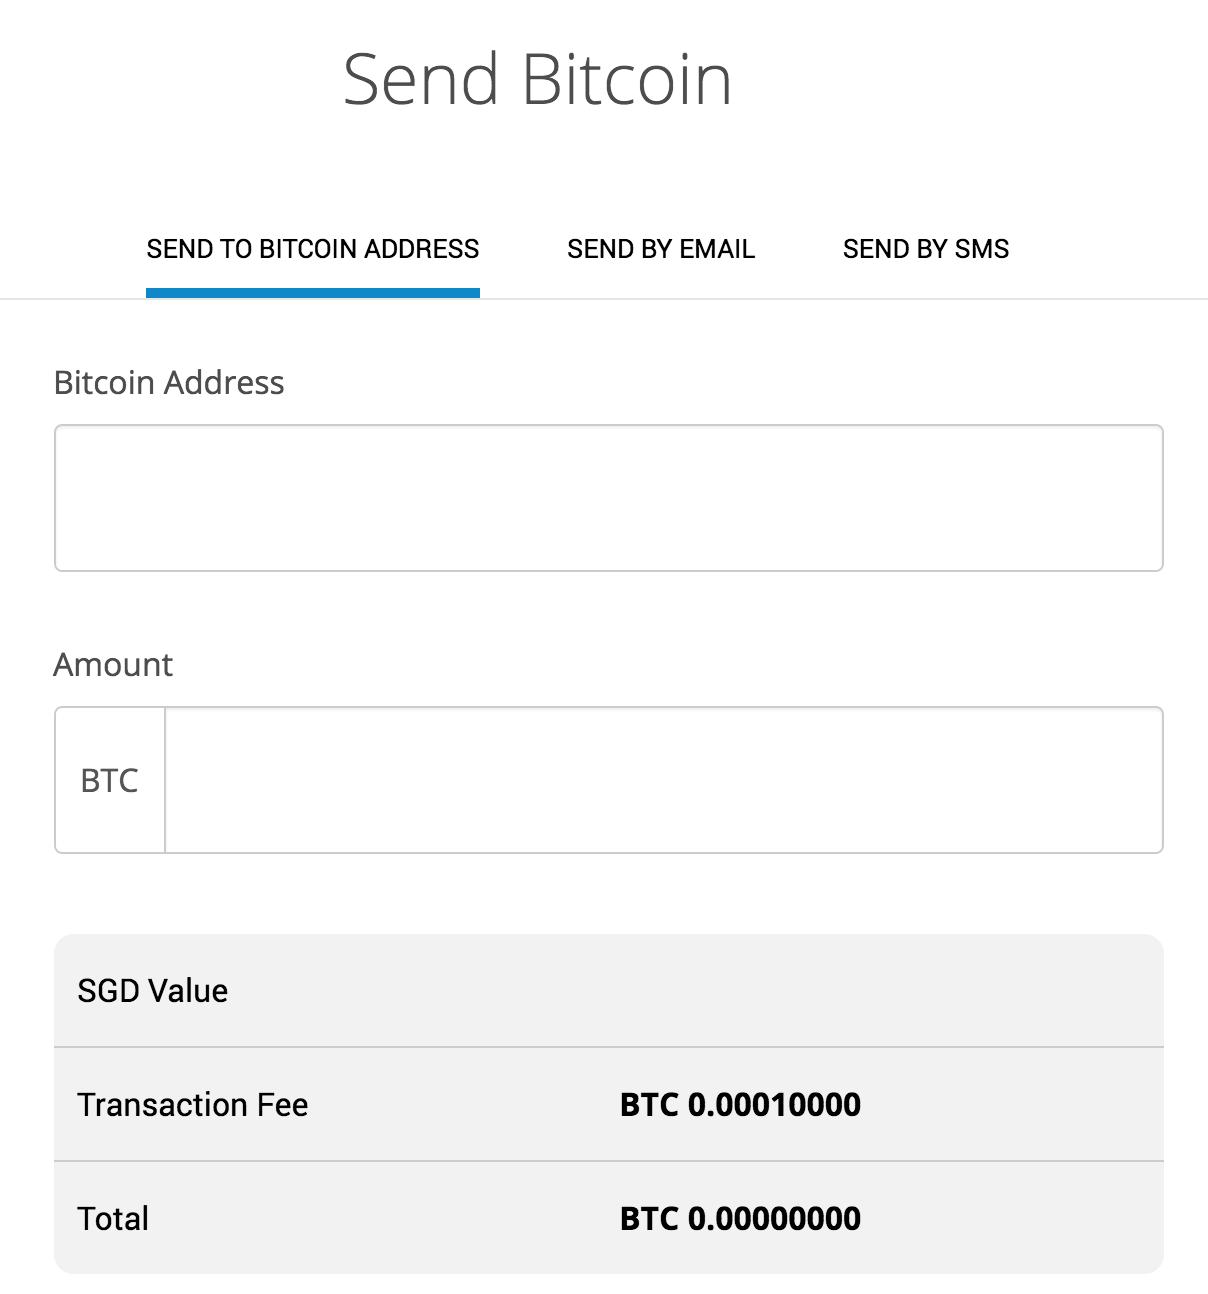 send bitcoins through coinhako to another bitcoin address